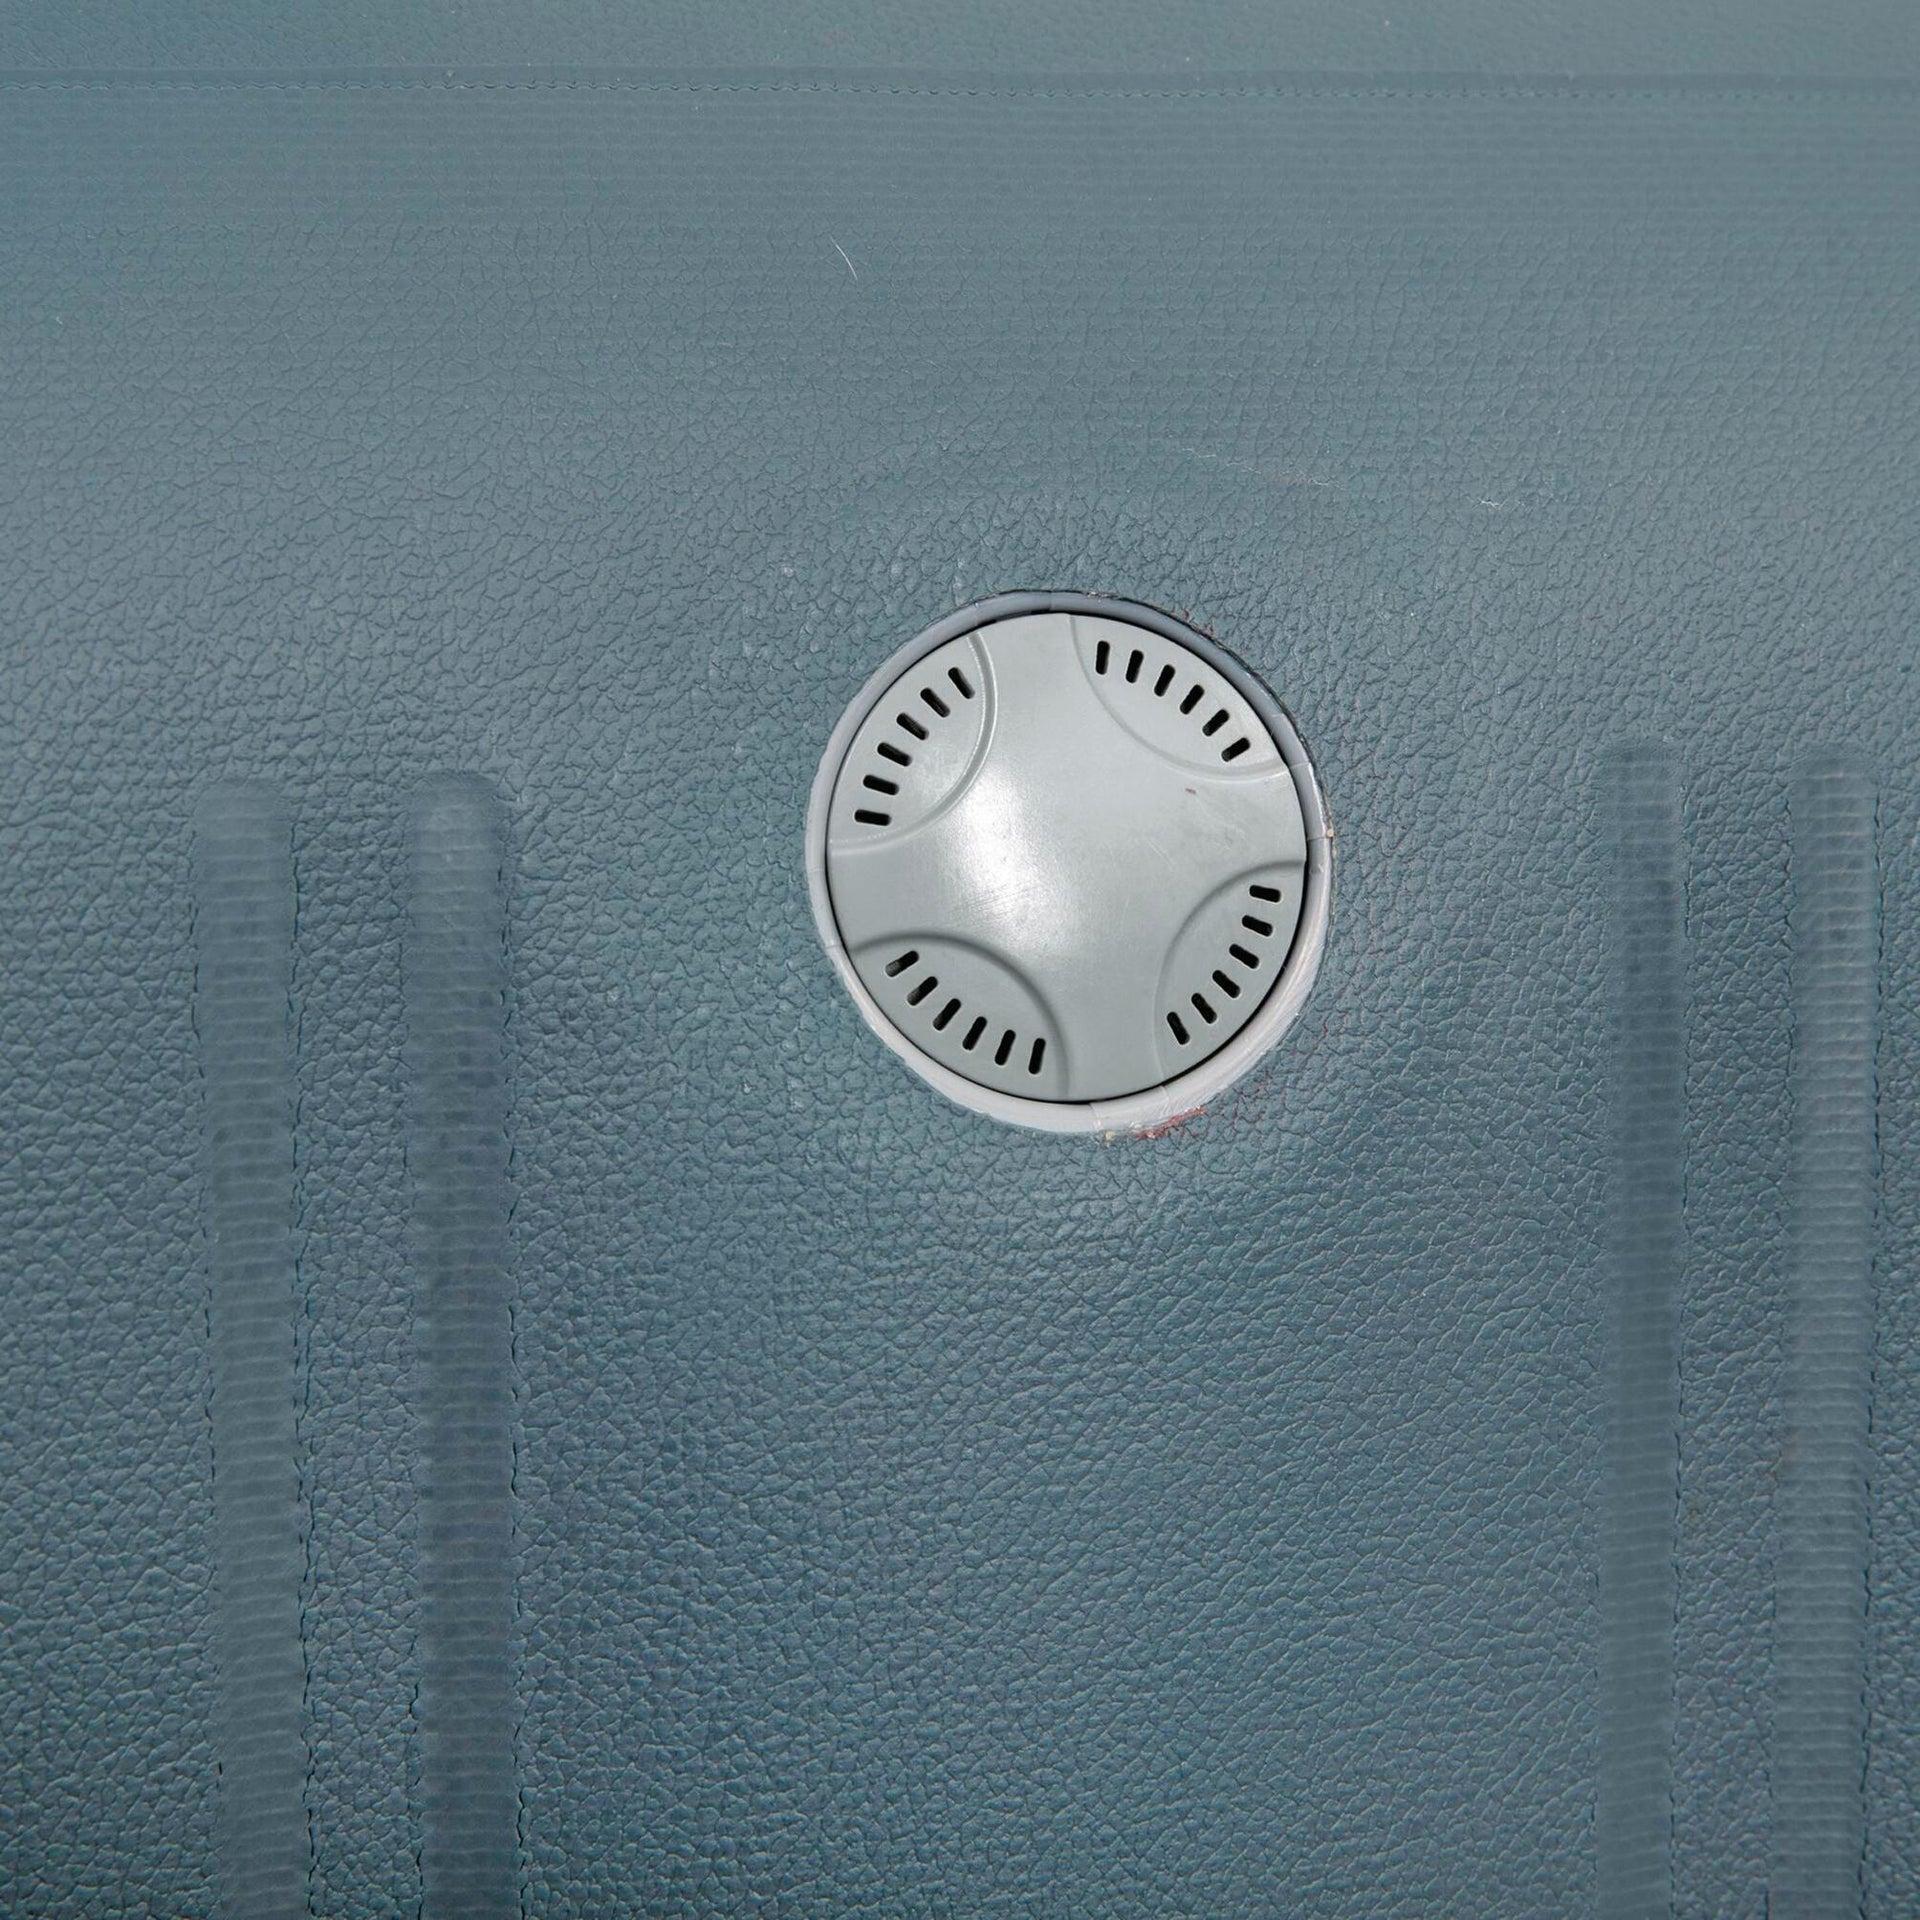 Piscina idromassaggio da esterno gonfiabile BESTWAY LAY-Z-SPA HAWAII HYDROJET PRO 180 x 180 cm - 19